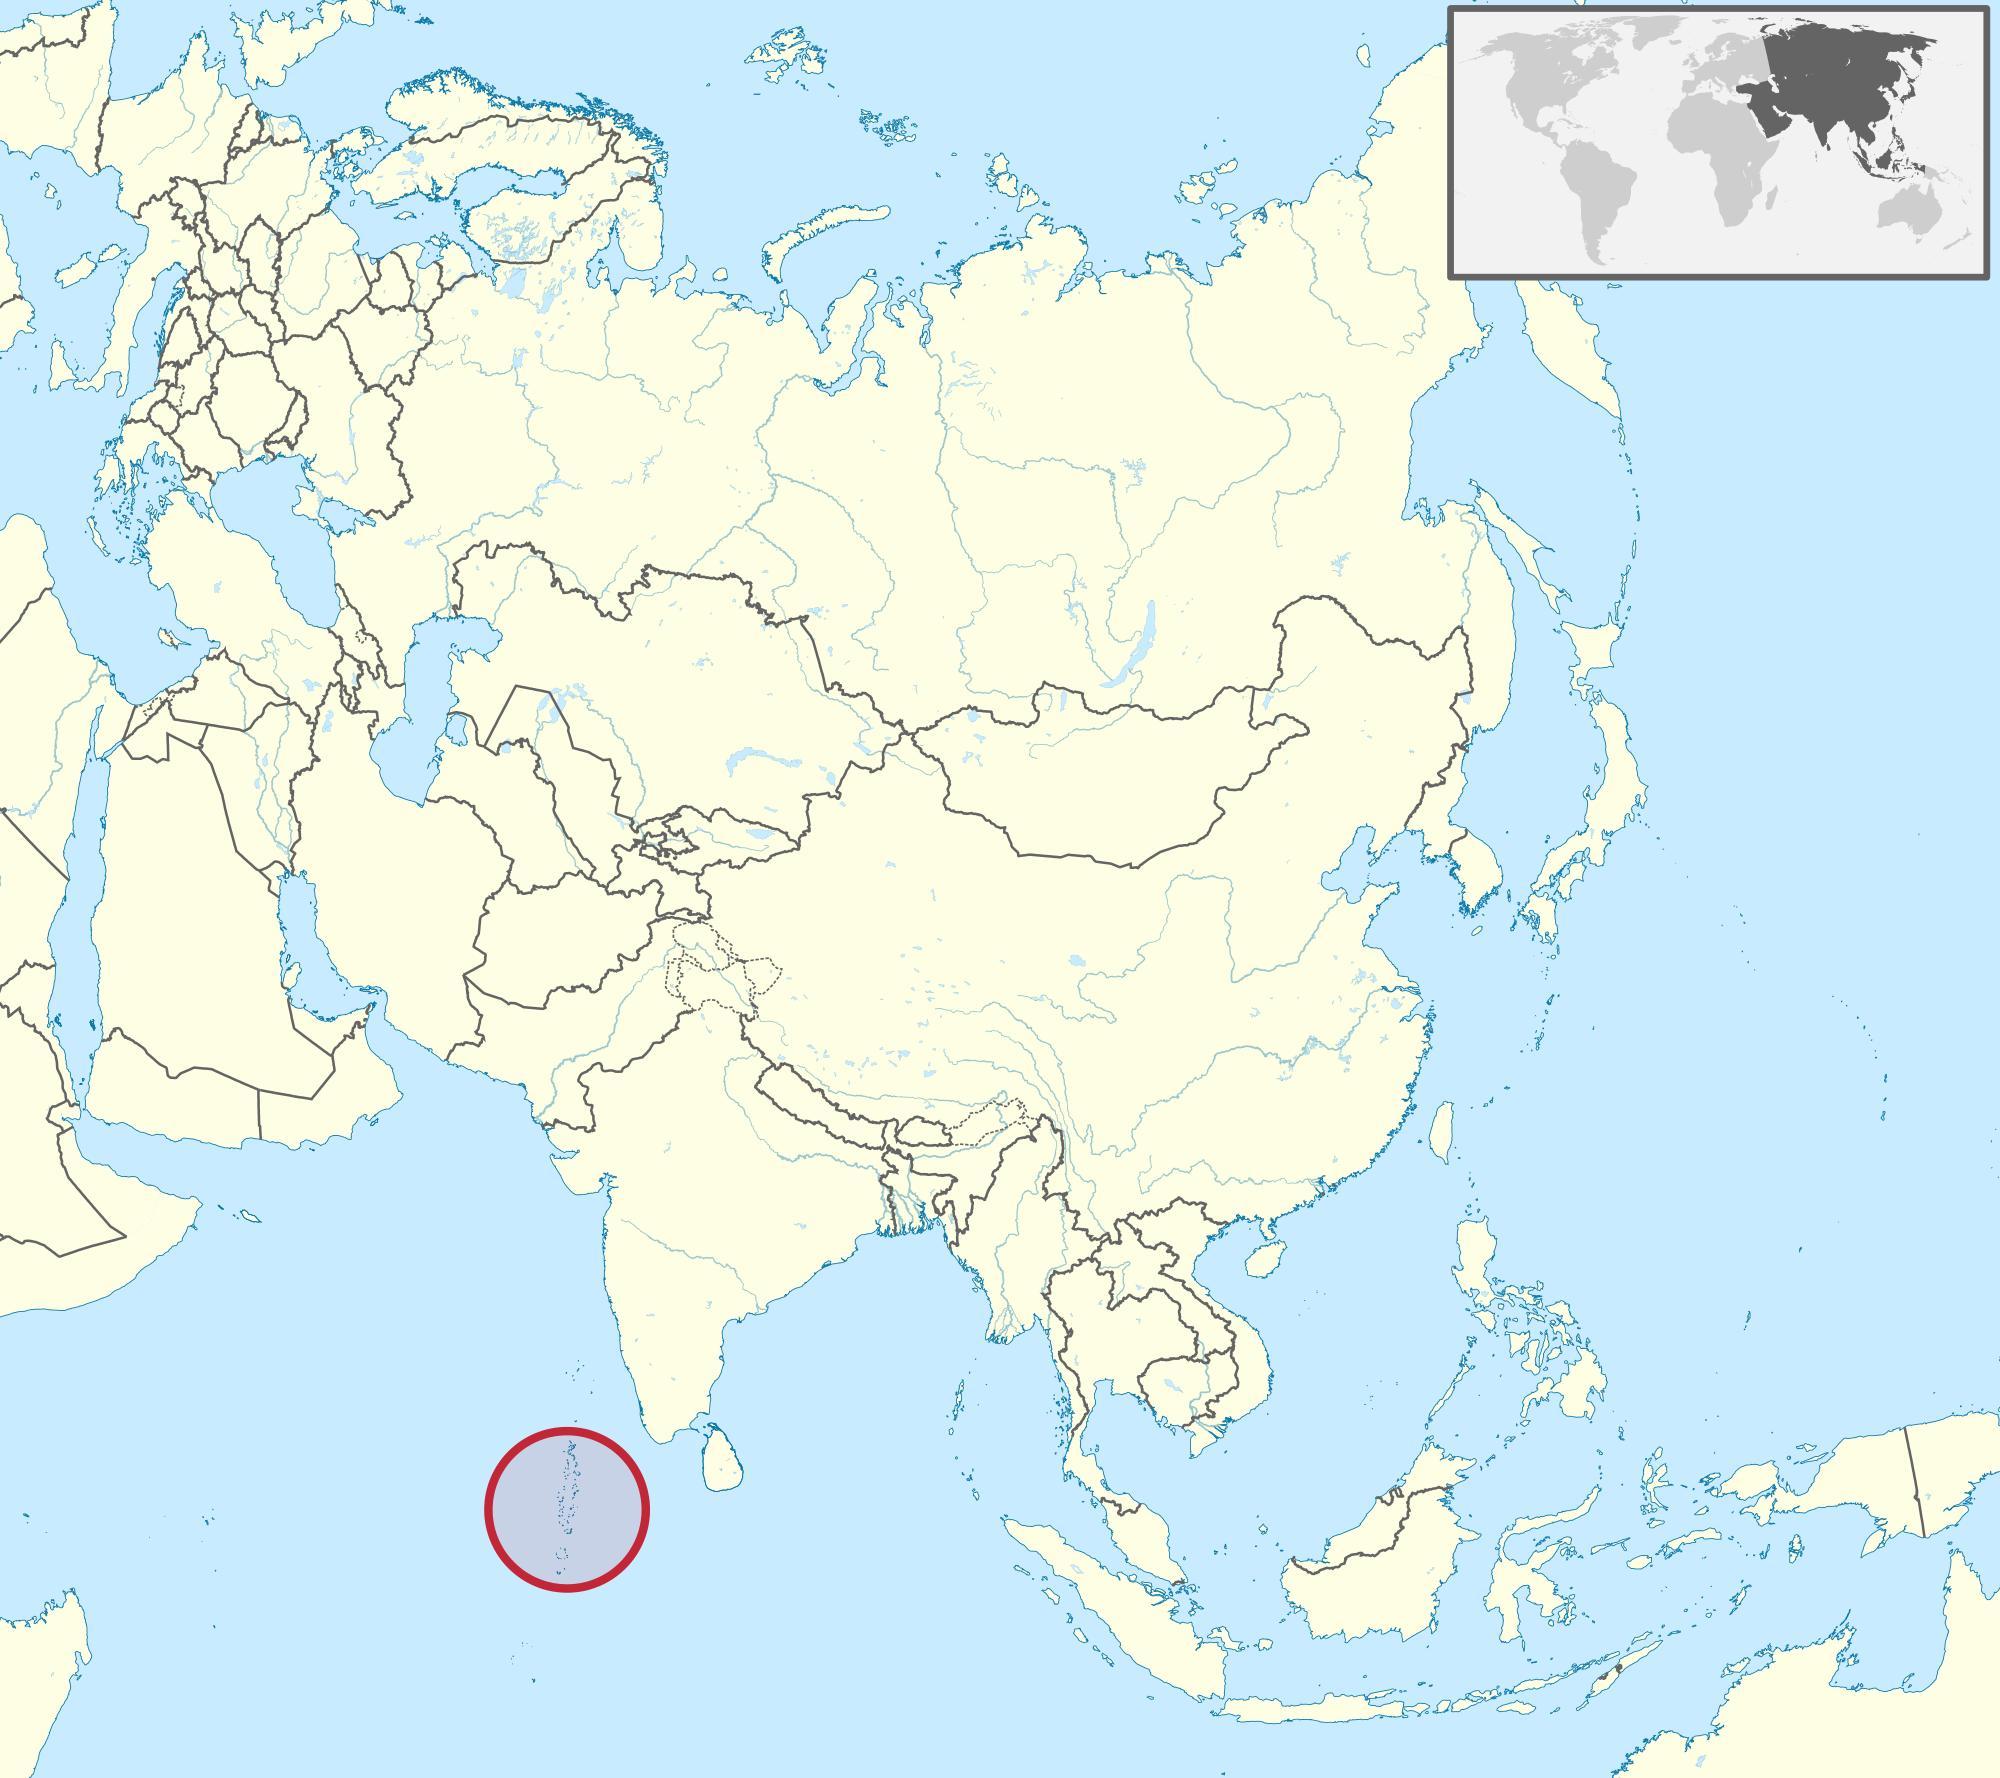 Carte Asie Maldives.Maldives Carte De L Asie Carte Des Maldives Carte De L Asie Asie